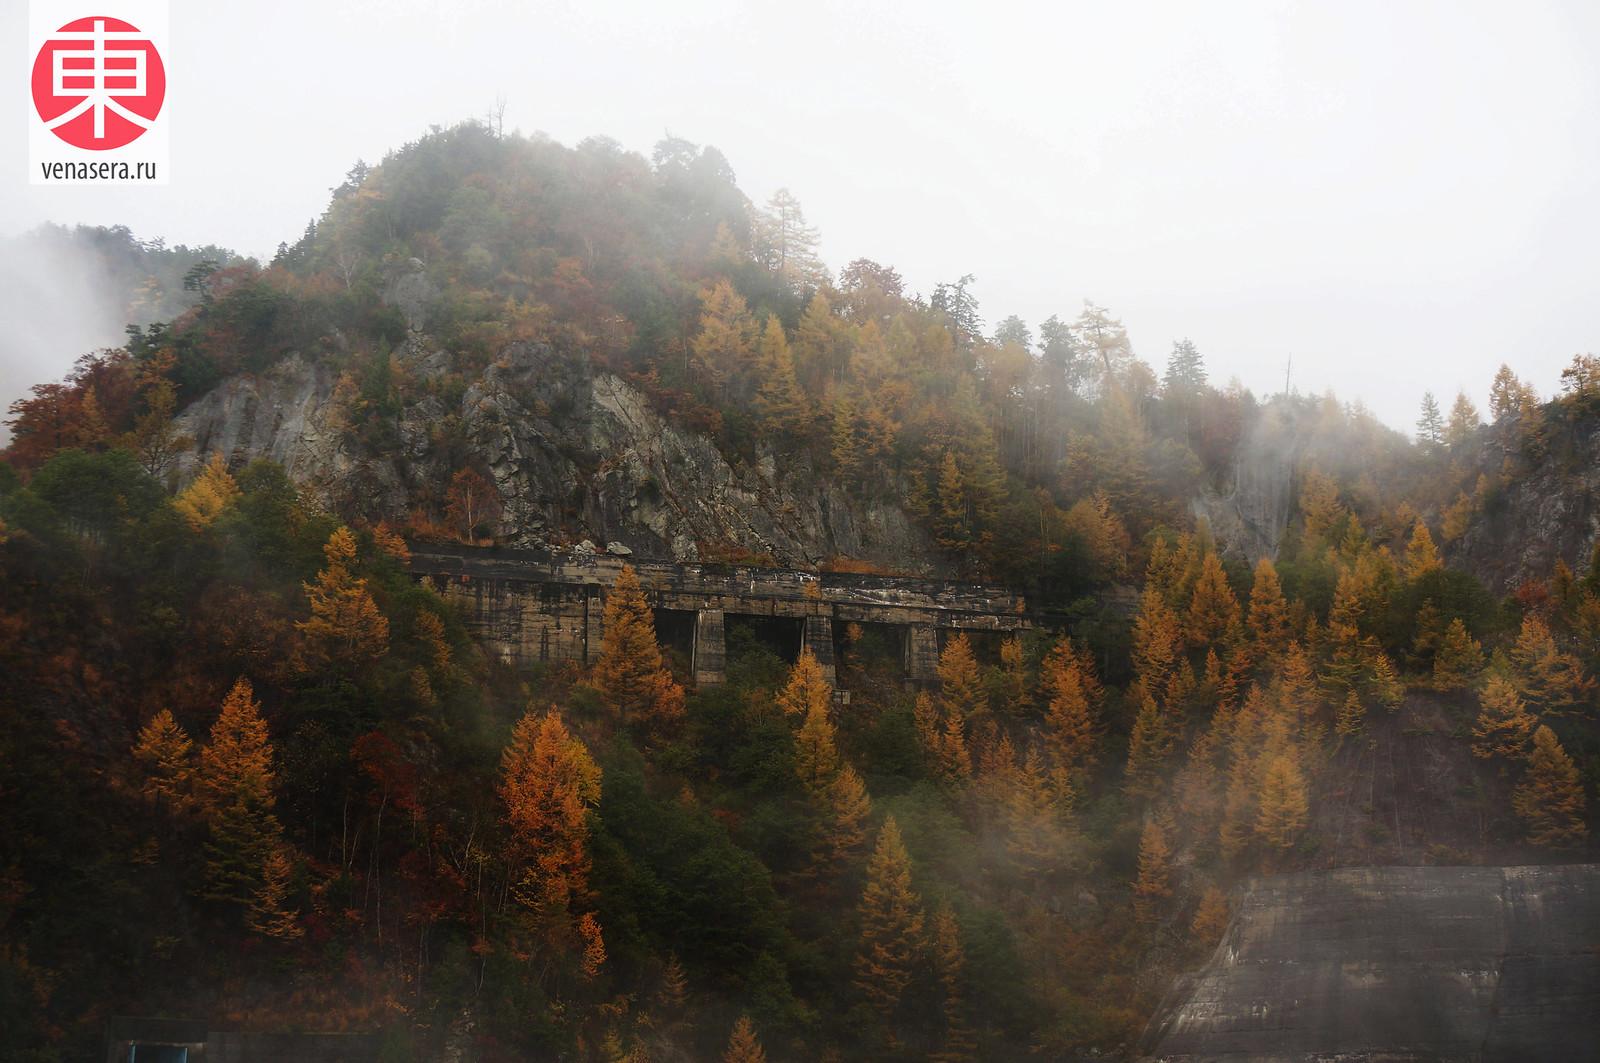 Плотина Куробэ (黒部ダム), Японские Альпы Татэяма Куробэ, Татэяма Куробэ, Tateyama Kurobe Alpine Route, 立山黒部, 立山黒部アルペンルート